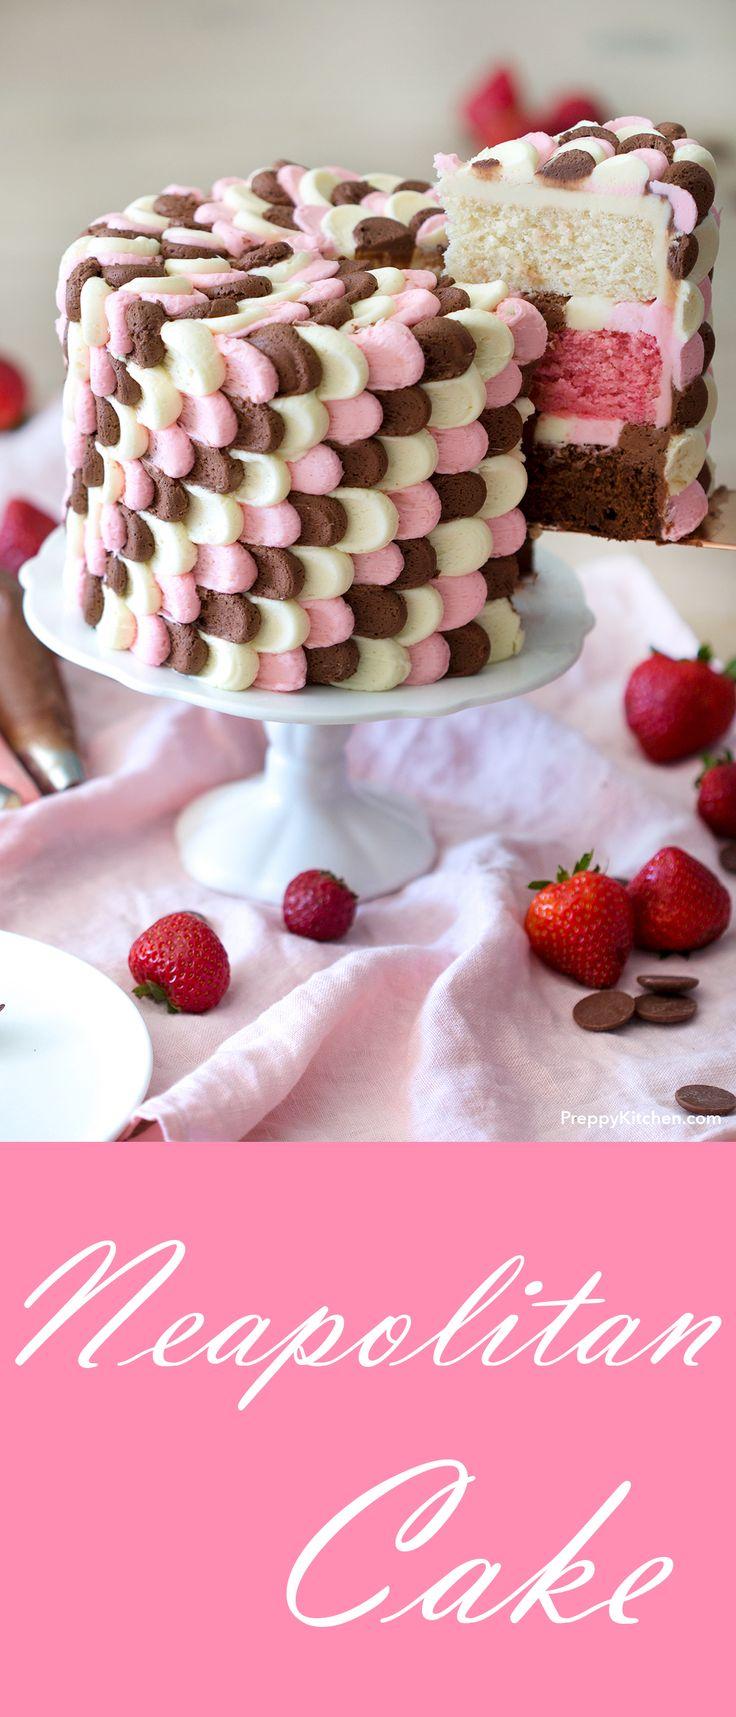 Neopolitan Cake made with 3 different layers of cake. Vanilla, Strawberry and Chocolate Cakes. Decorated with Chocolate Frosting, Strawberry Frosting and Vanilla Frosting.  | #desserts #dessert #cakes #neopolitan #strawberrycake #chocolatecake #vanillacake #birthdaycake